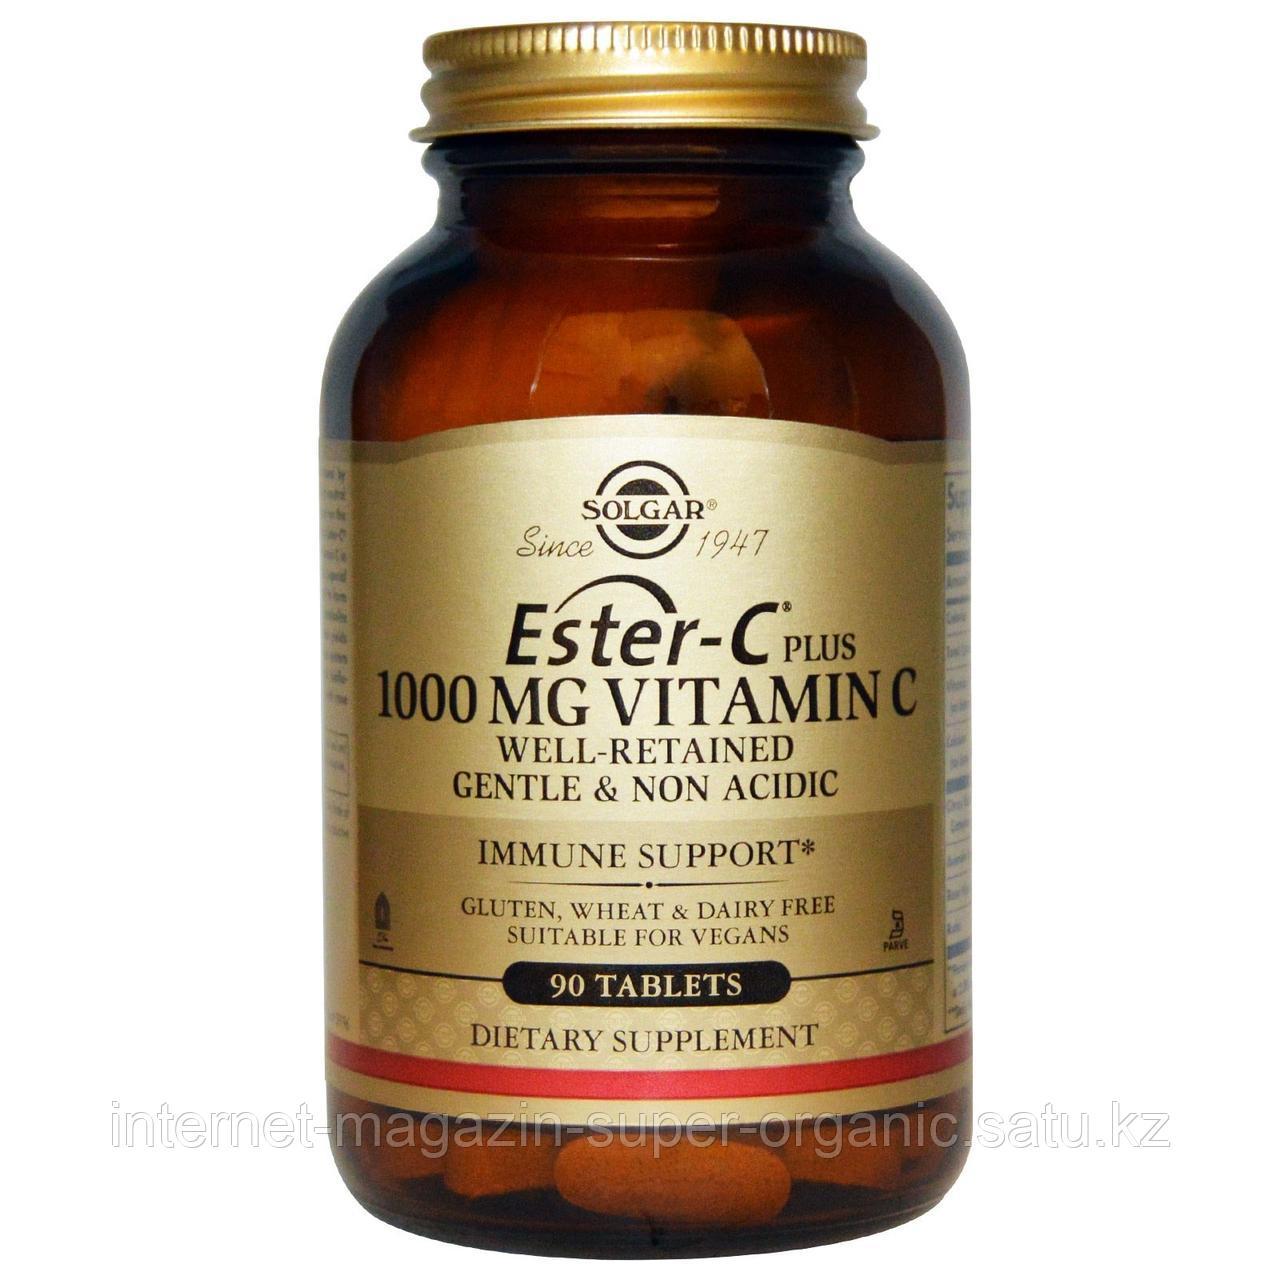 Ester-C Plus, витамин С, 1000 мг , 90 таблеток, Solgar